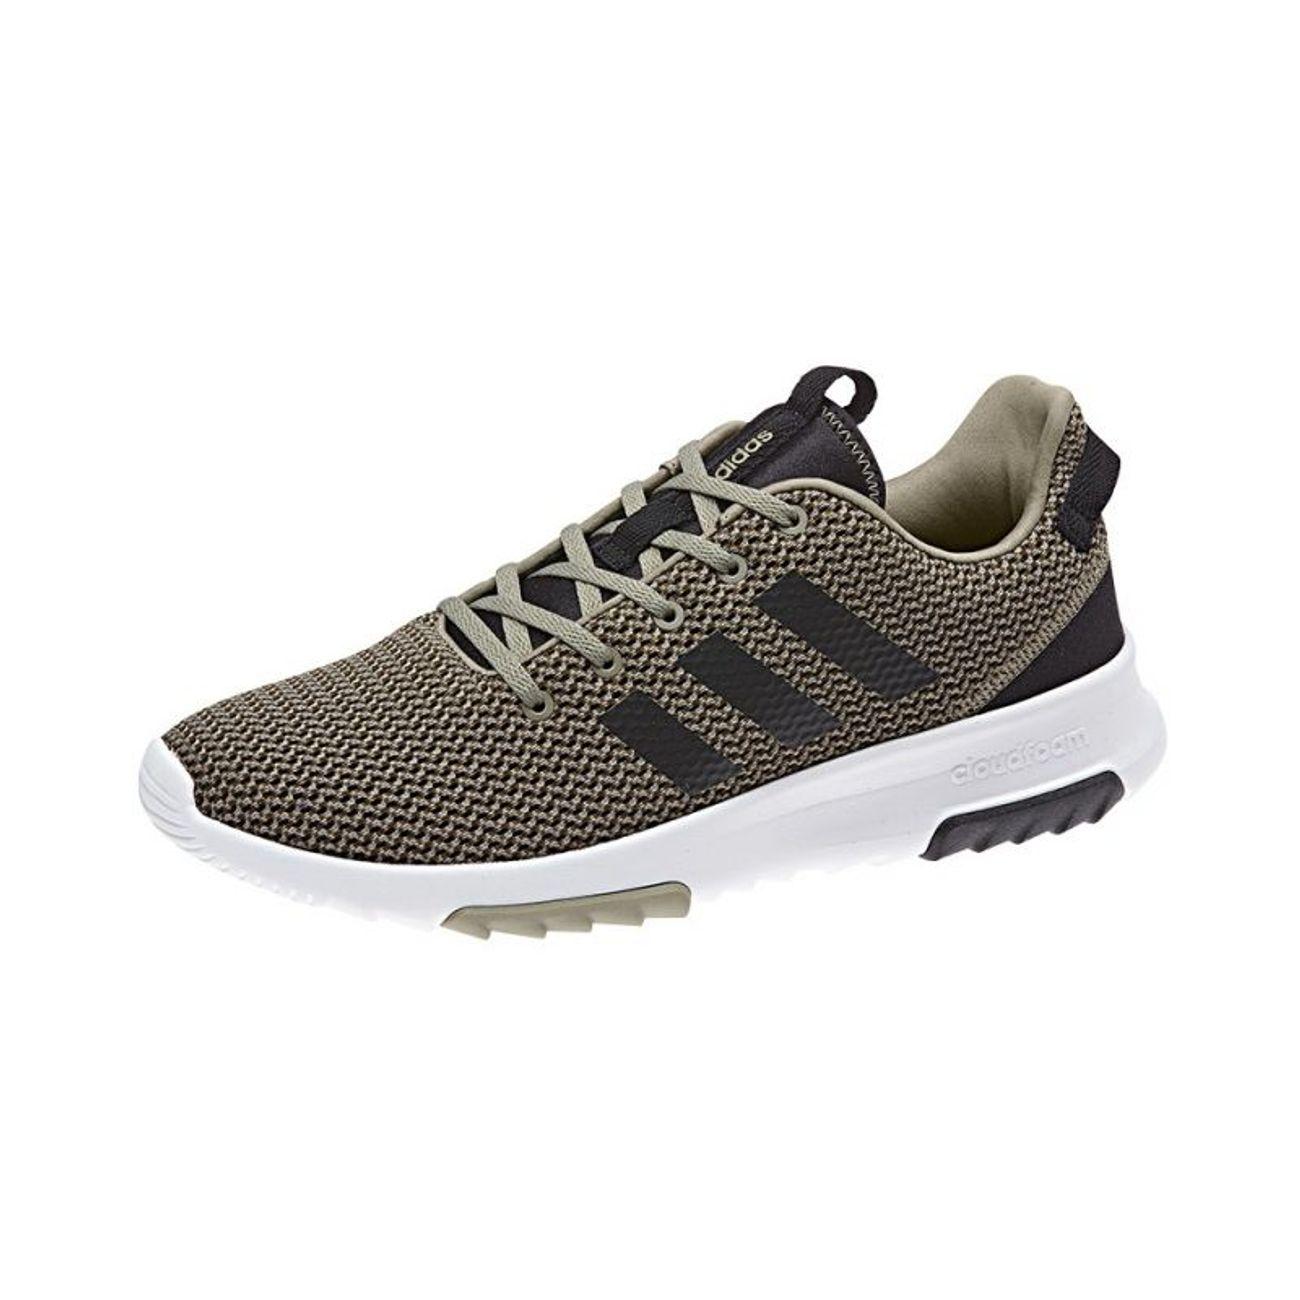 ModeLifestyle Neo Chaussures Racer Noir Blanc Cf Homme Tr Vert Adidas A43j5LR